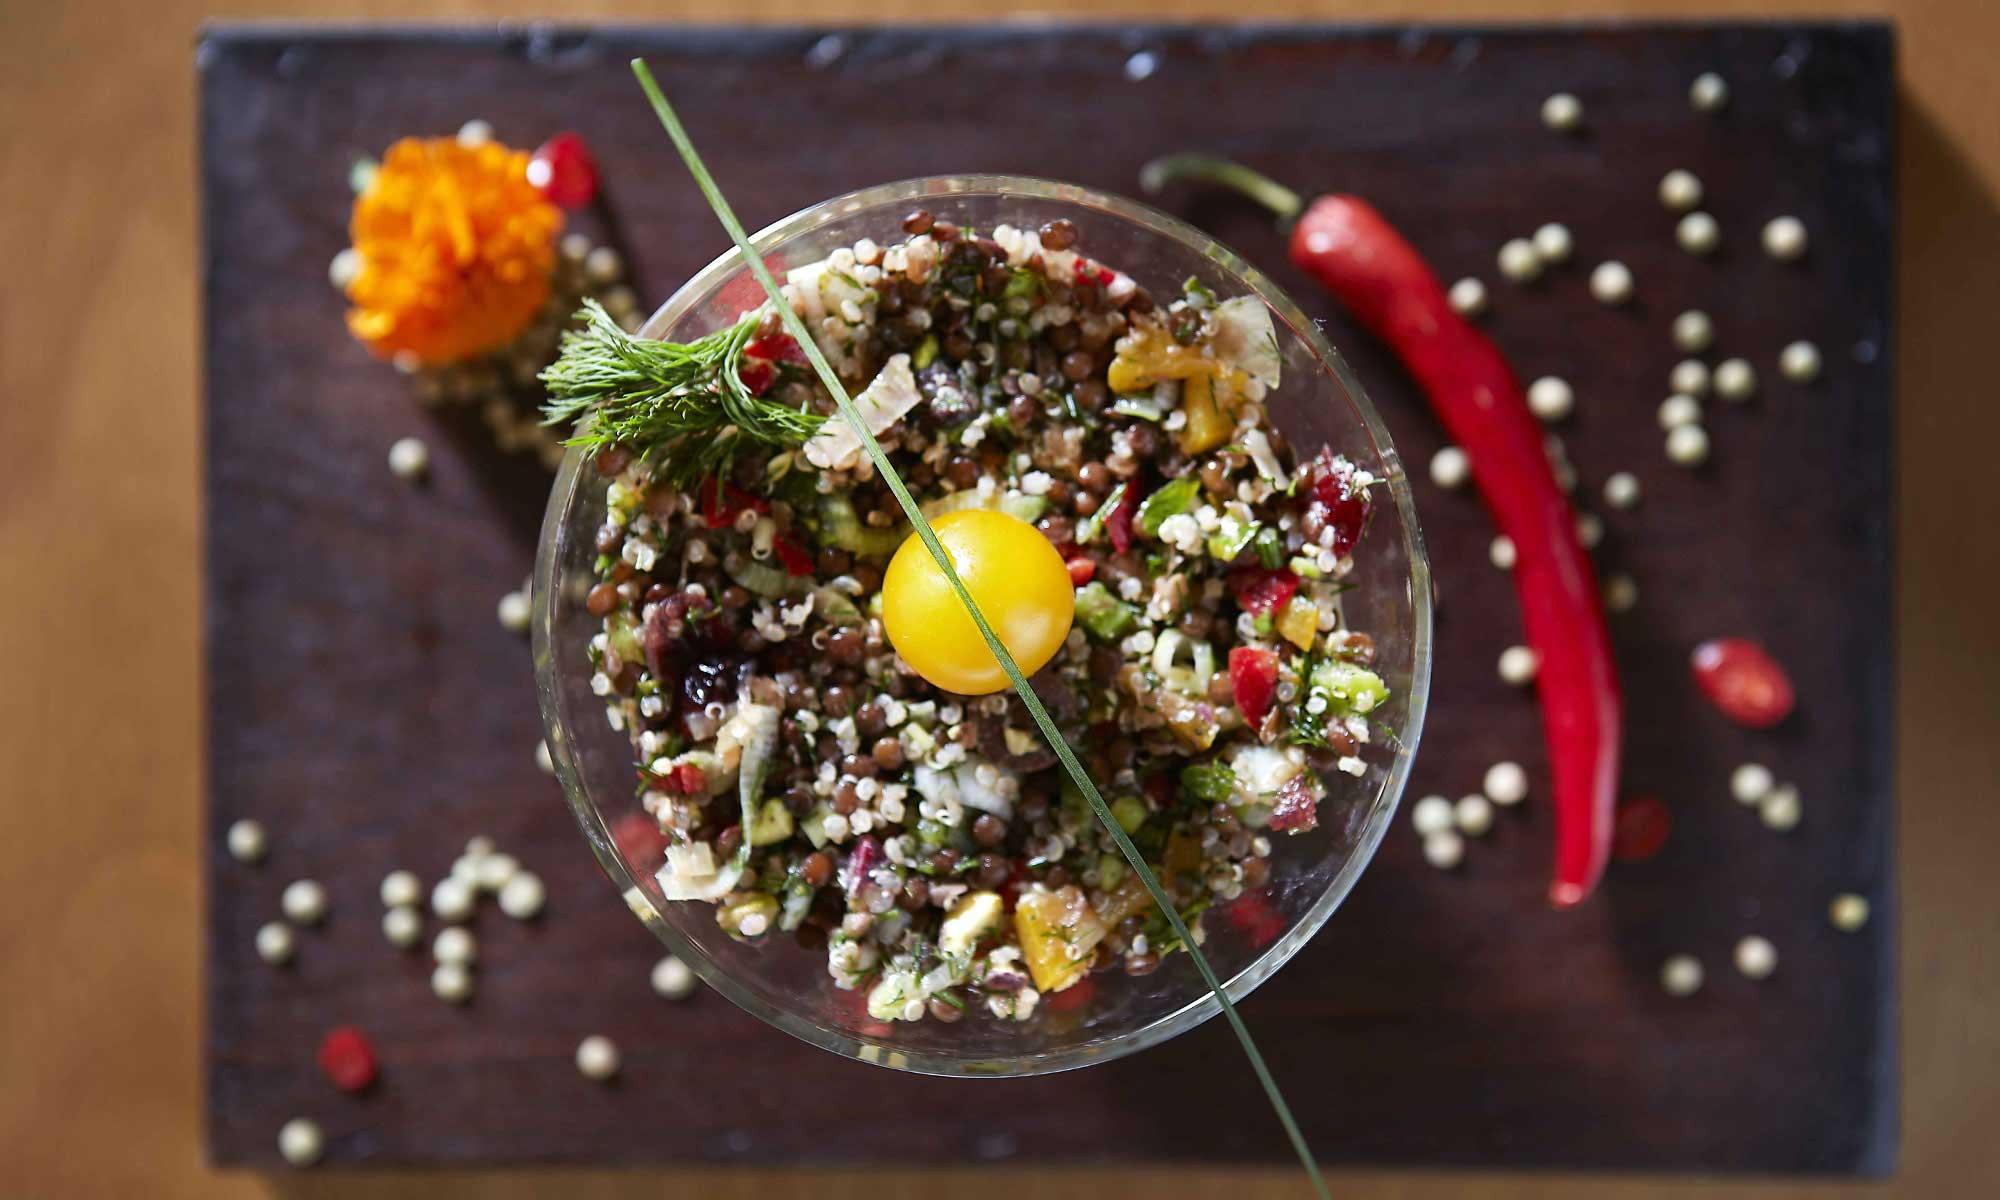 Original gastronomical delicacies inspired by Greek cuisine are served at Kiouzin, Athens. Source: Kiouzin